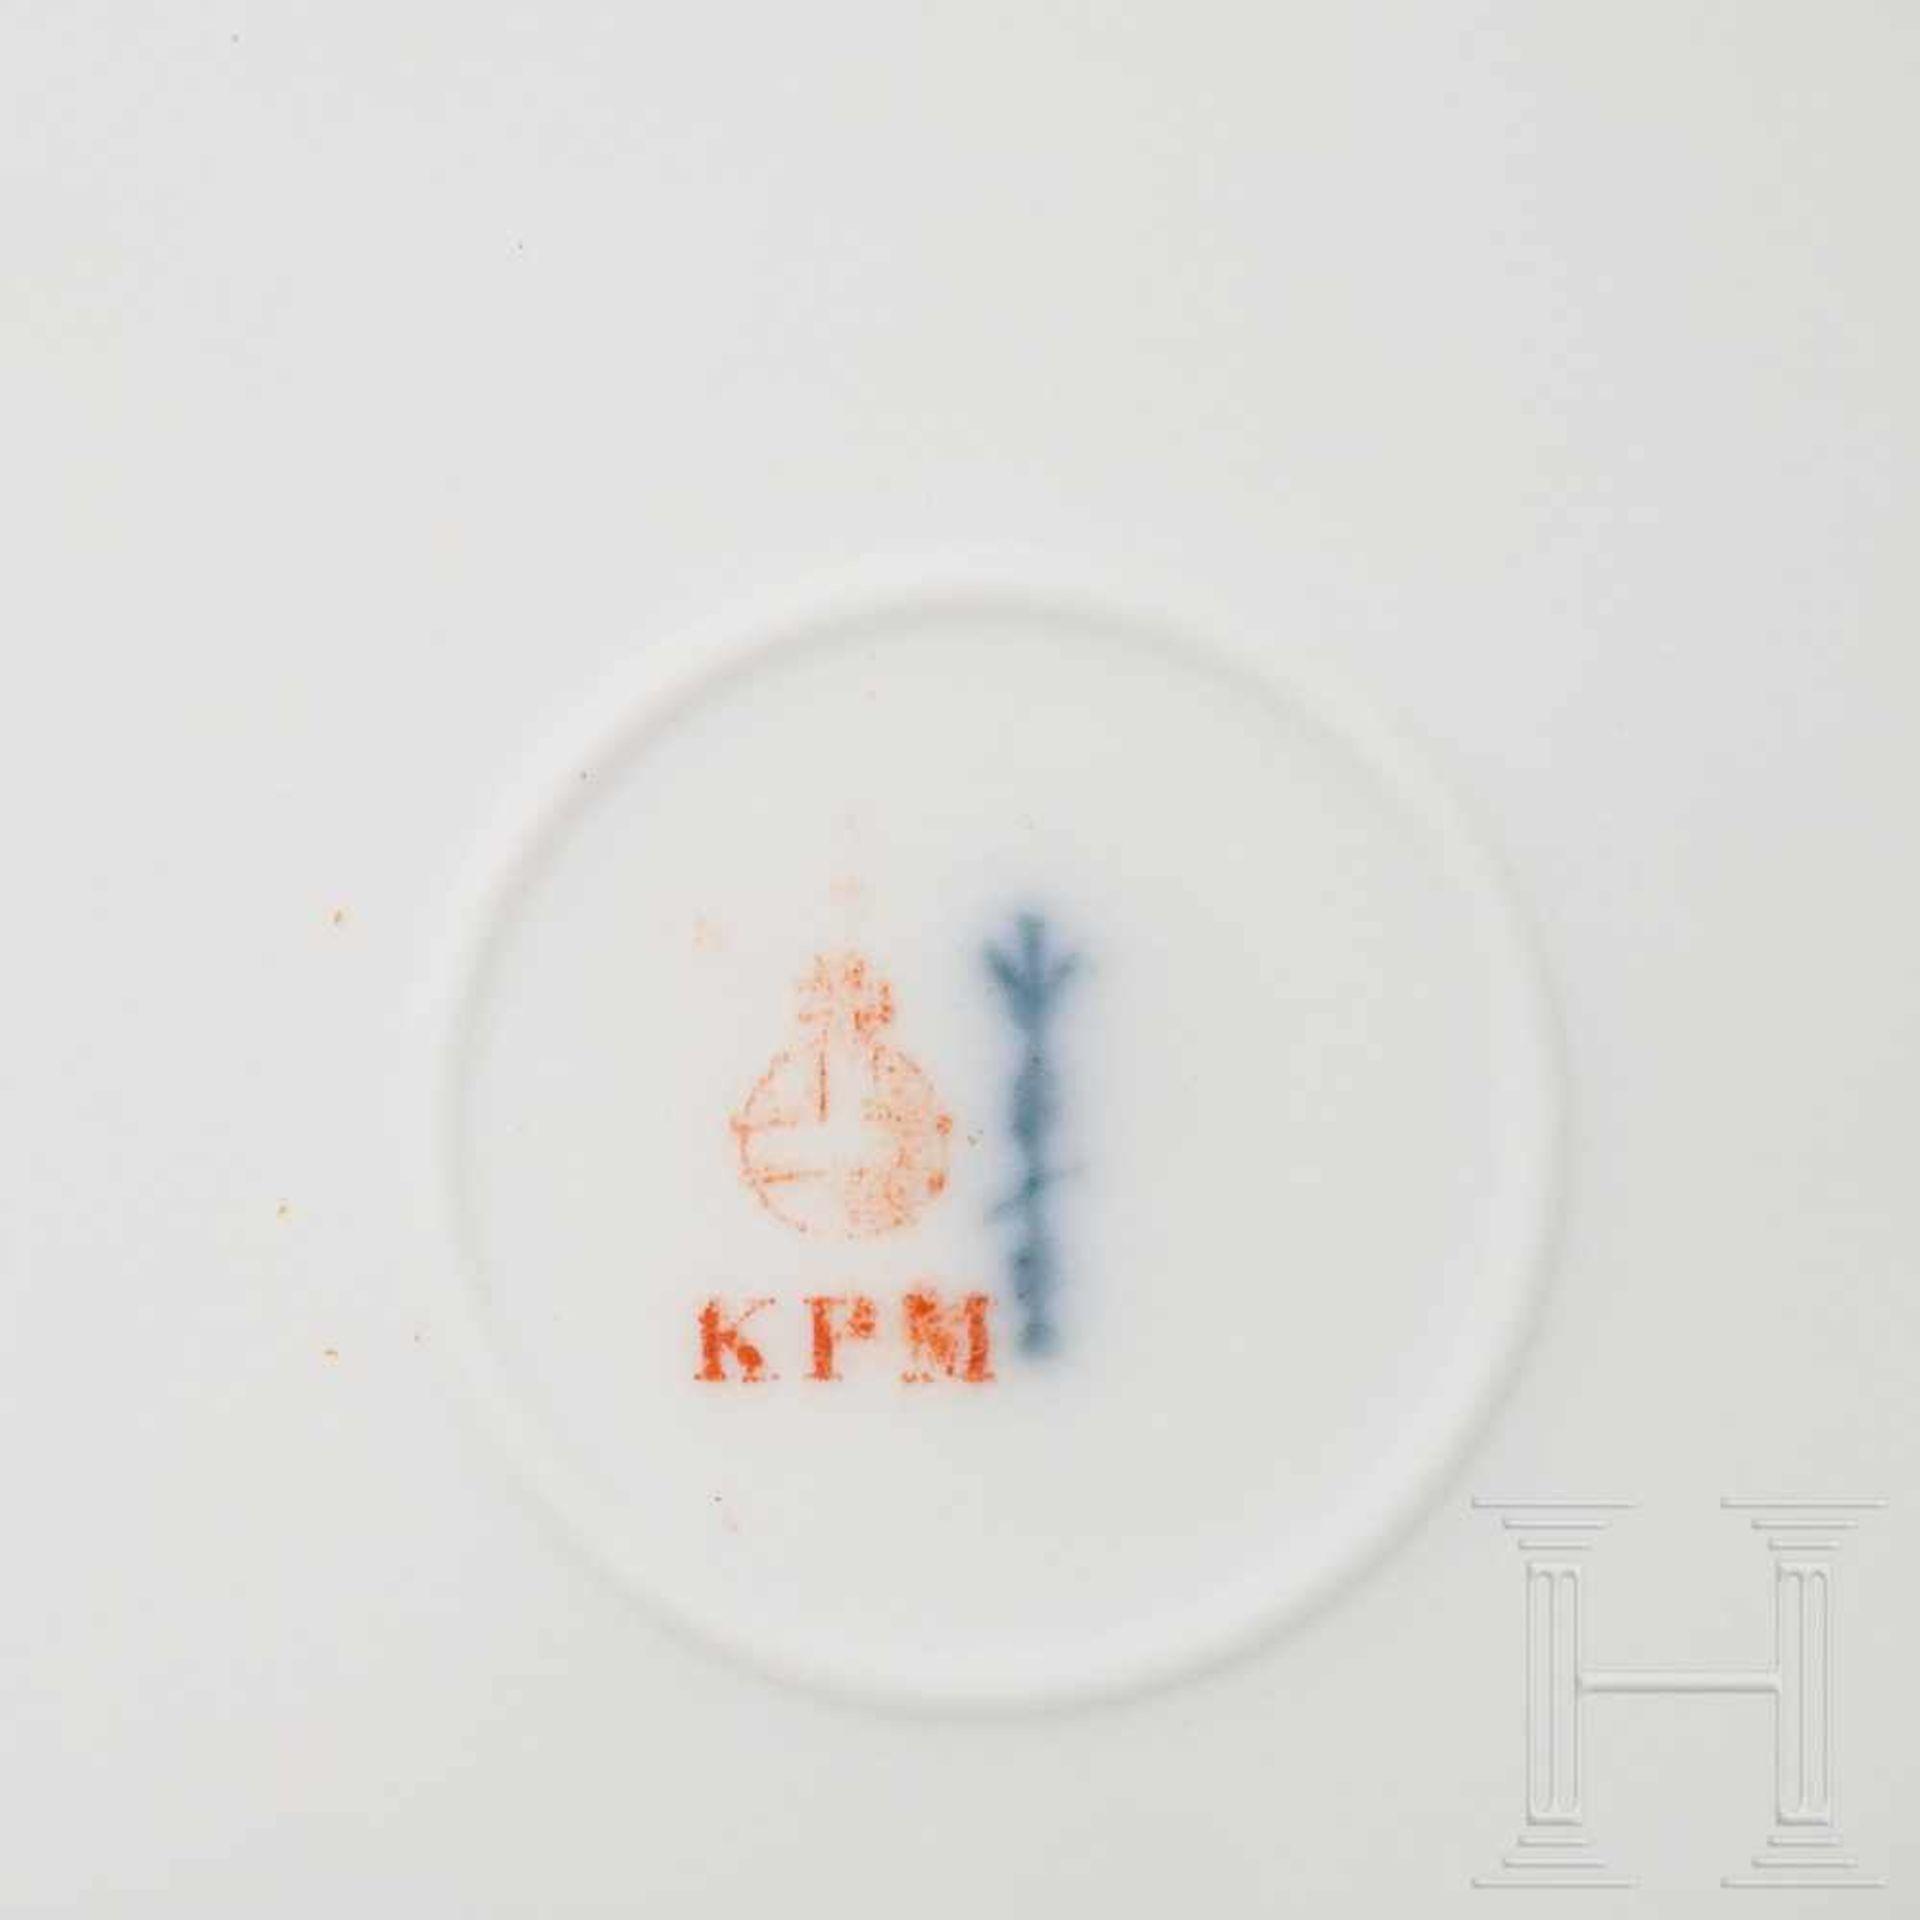 Los 6039 - Hermann Göring - two dinner plates from his KPM dining serviceWeißes, glasiertes Porzellan mit